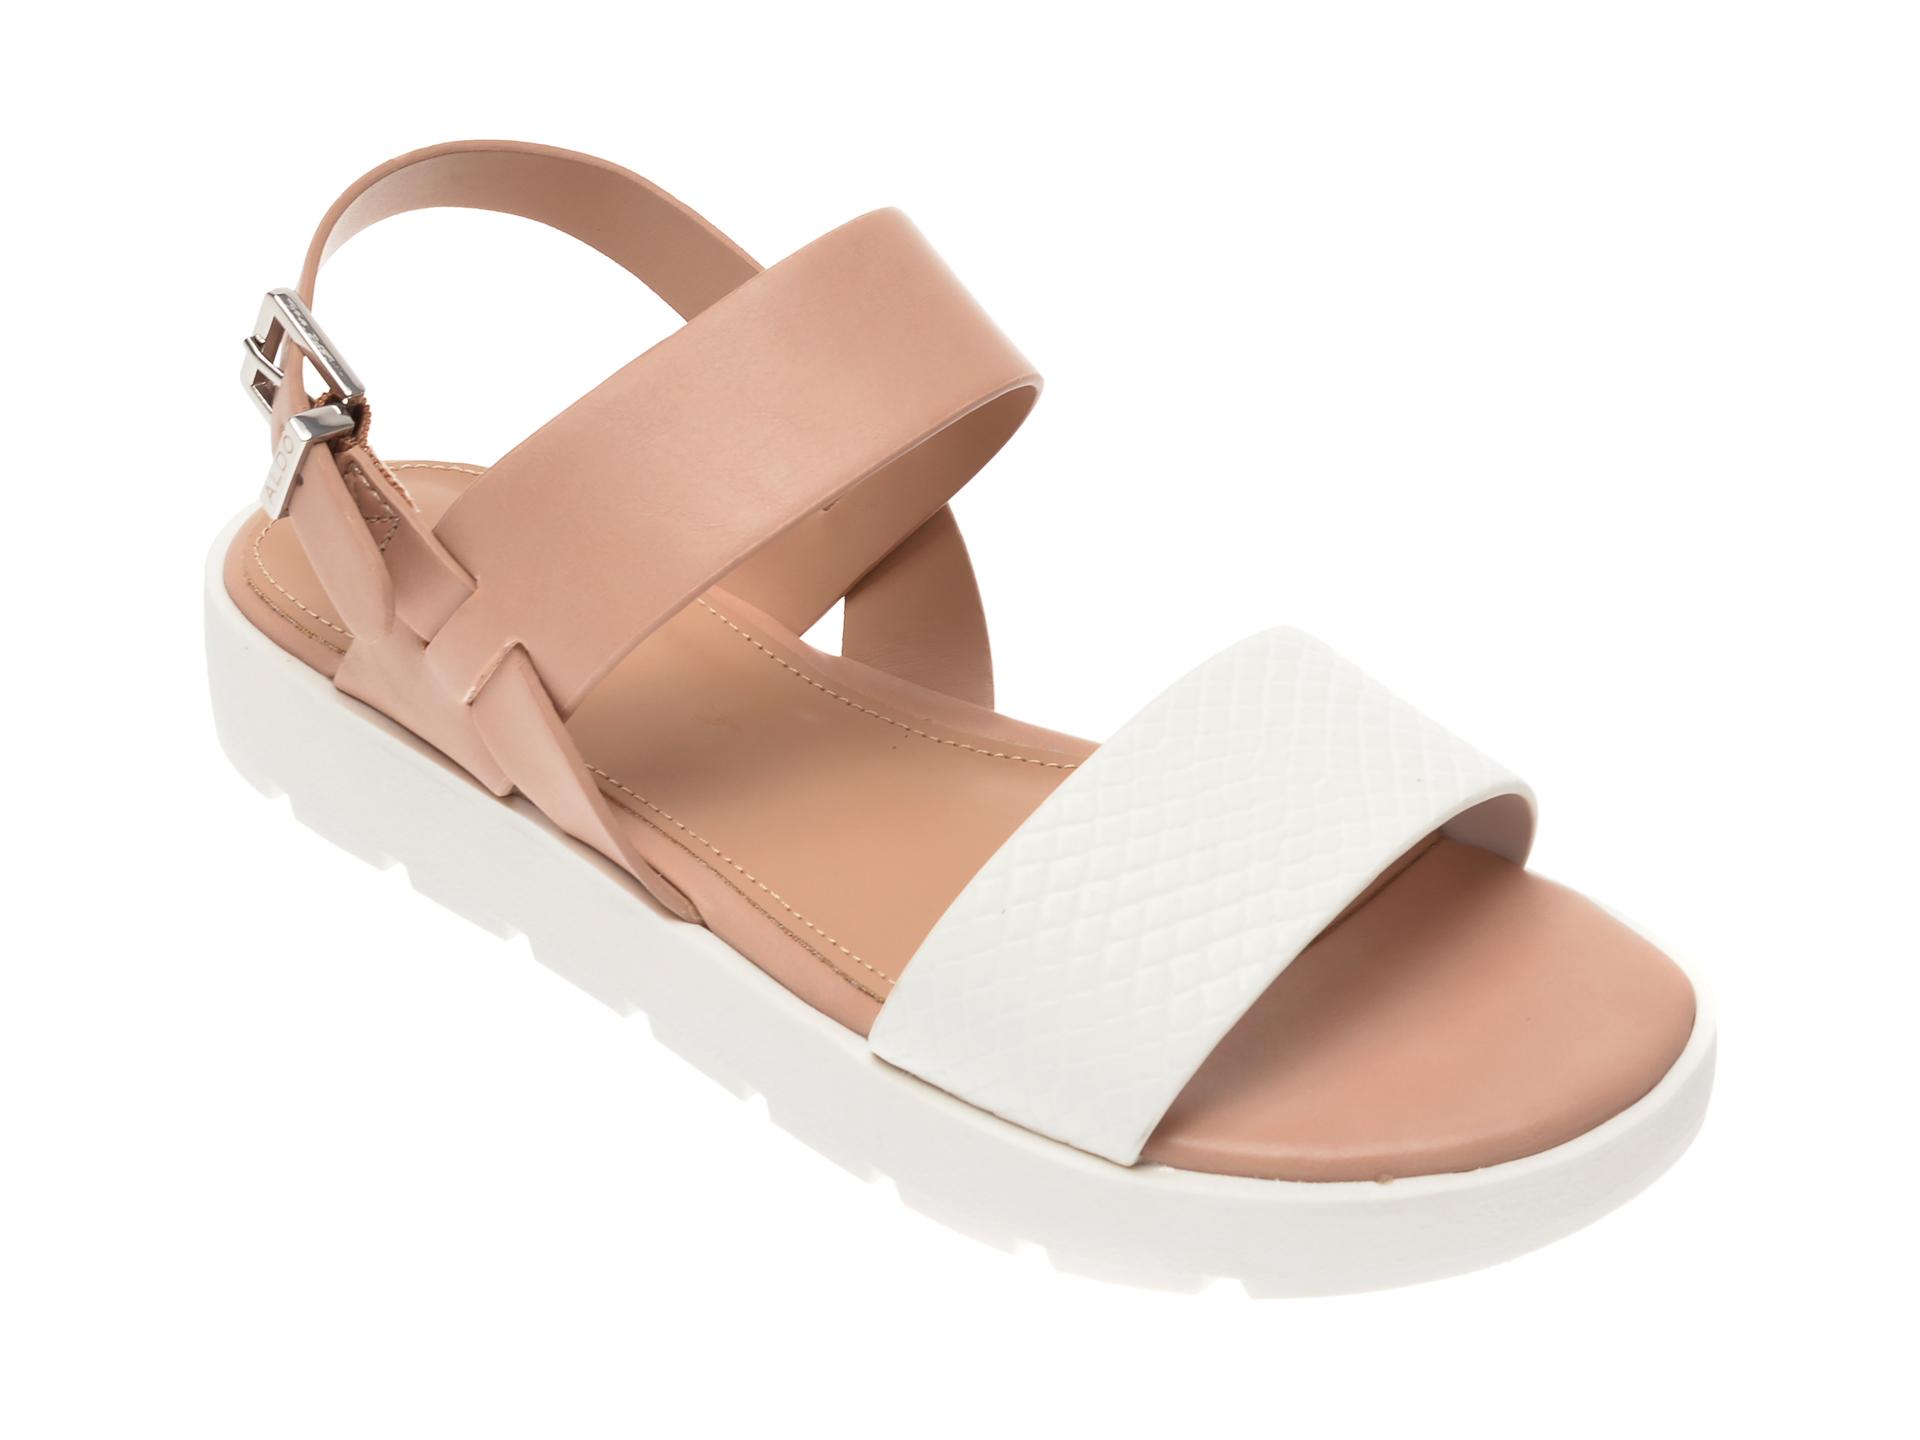 Sandale ALDO albe, Dwylia121, din piele ecologica